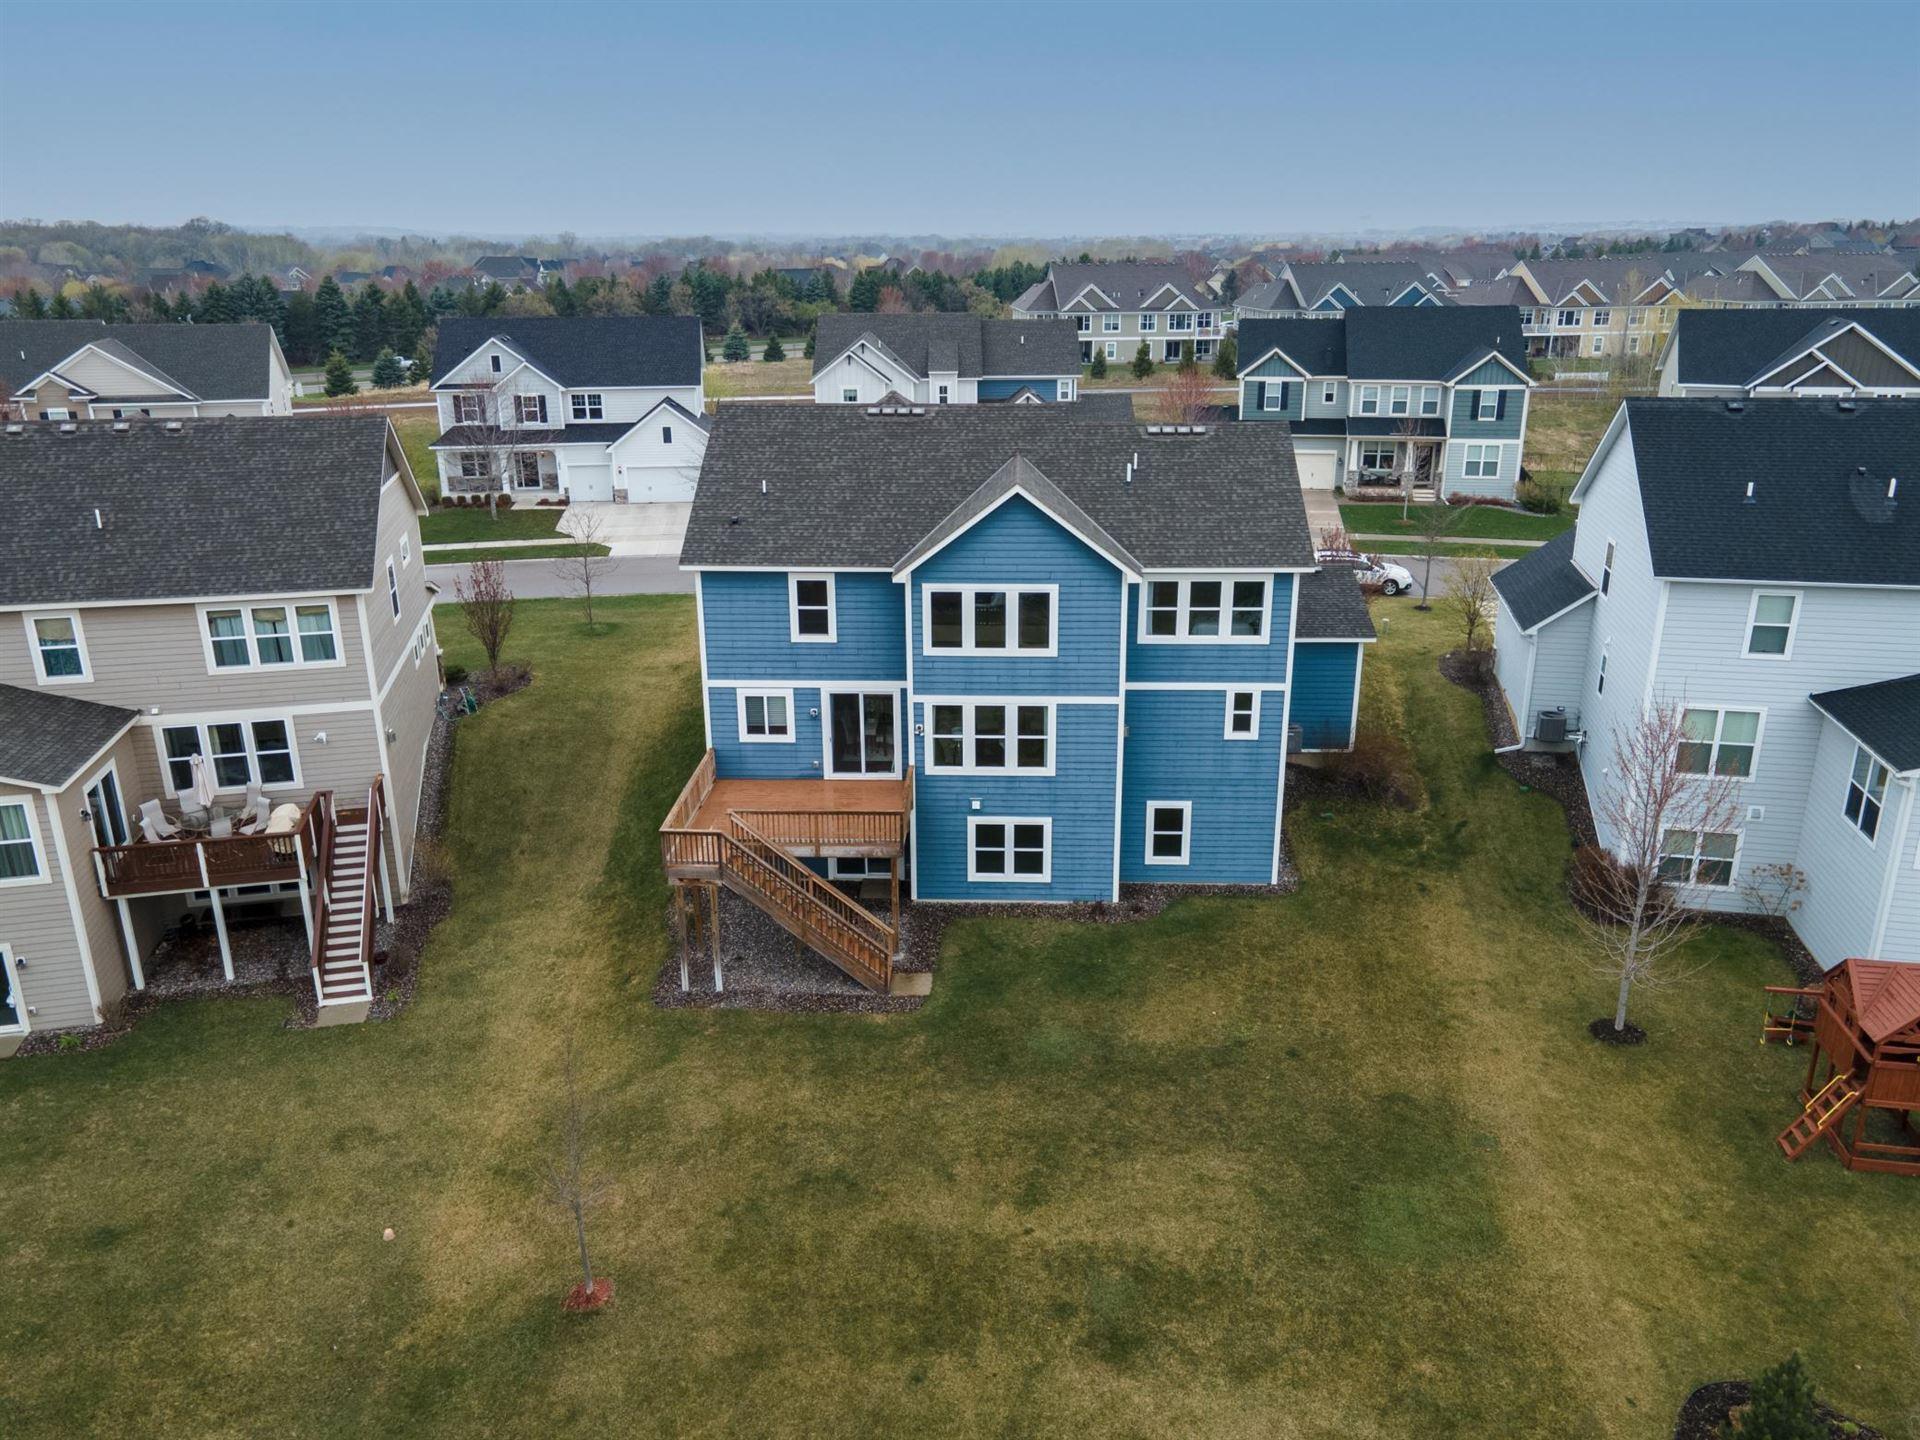 Photo of 1667 Bluewater Lane, Woodbury, MN 55129 (MLS # 5745235)